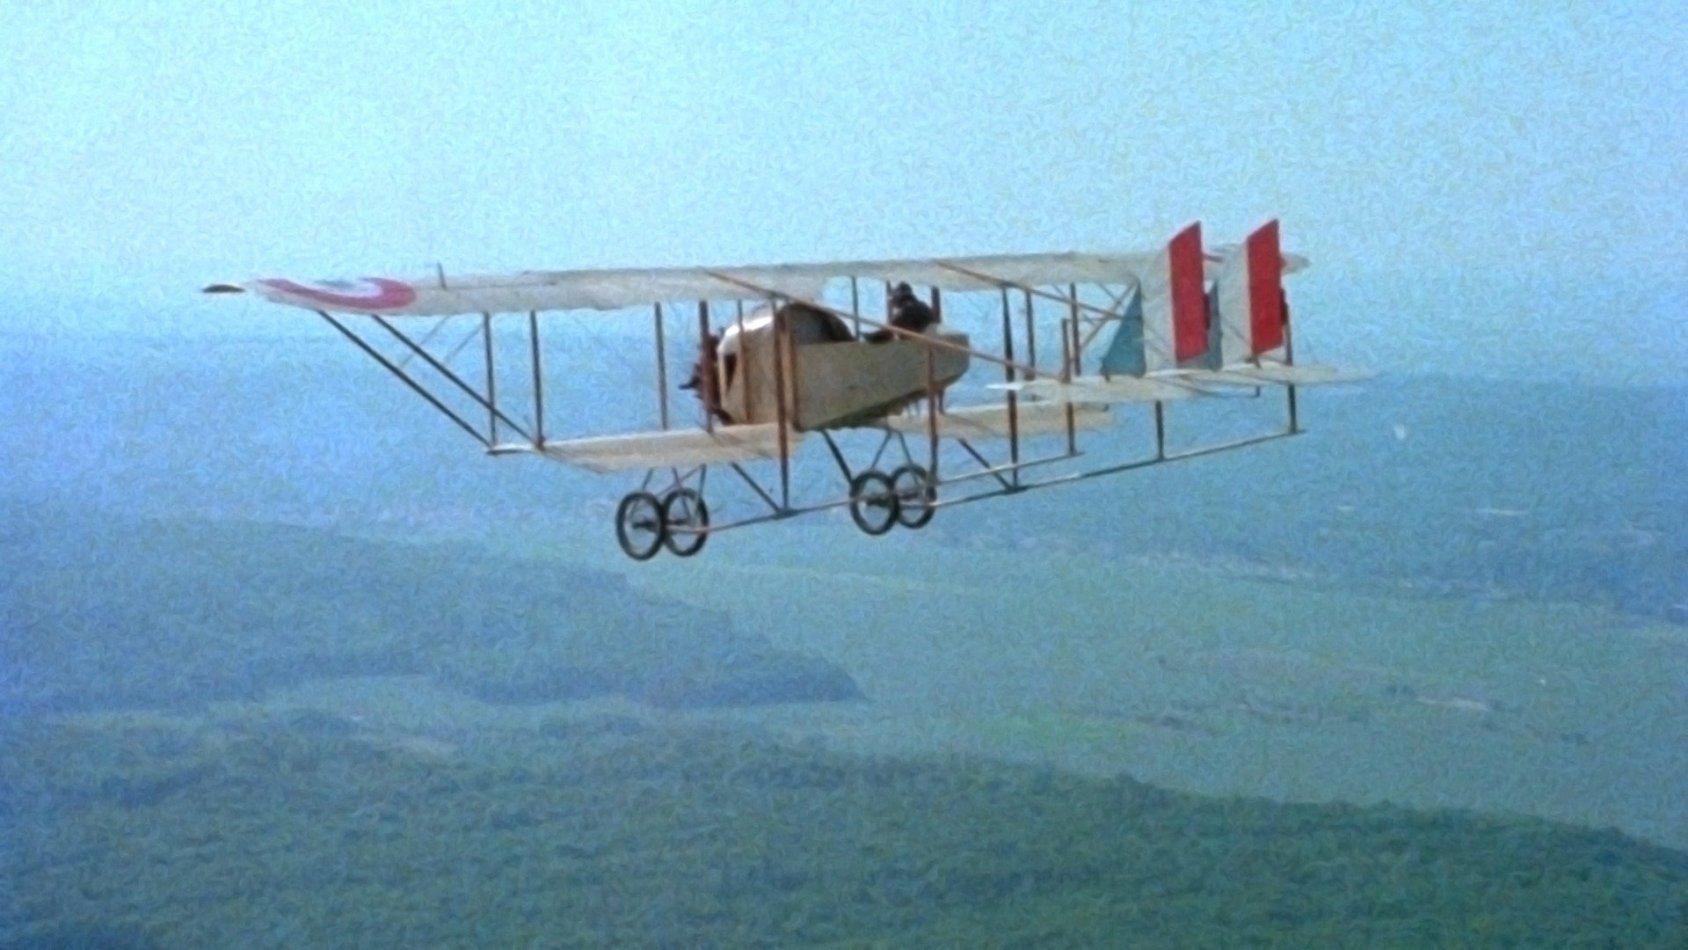 Flygets historia